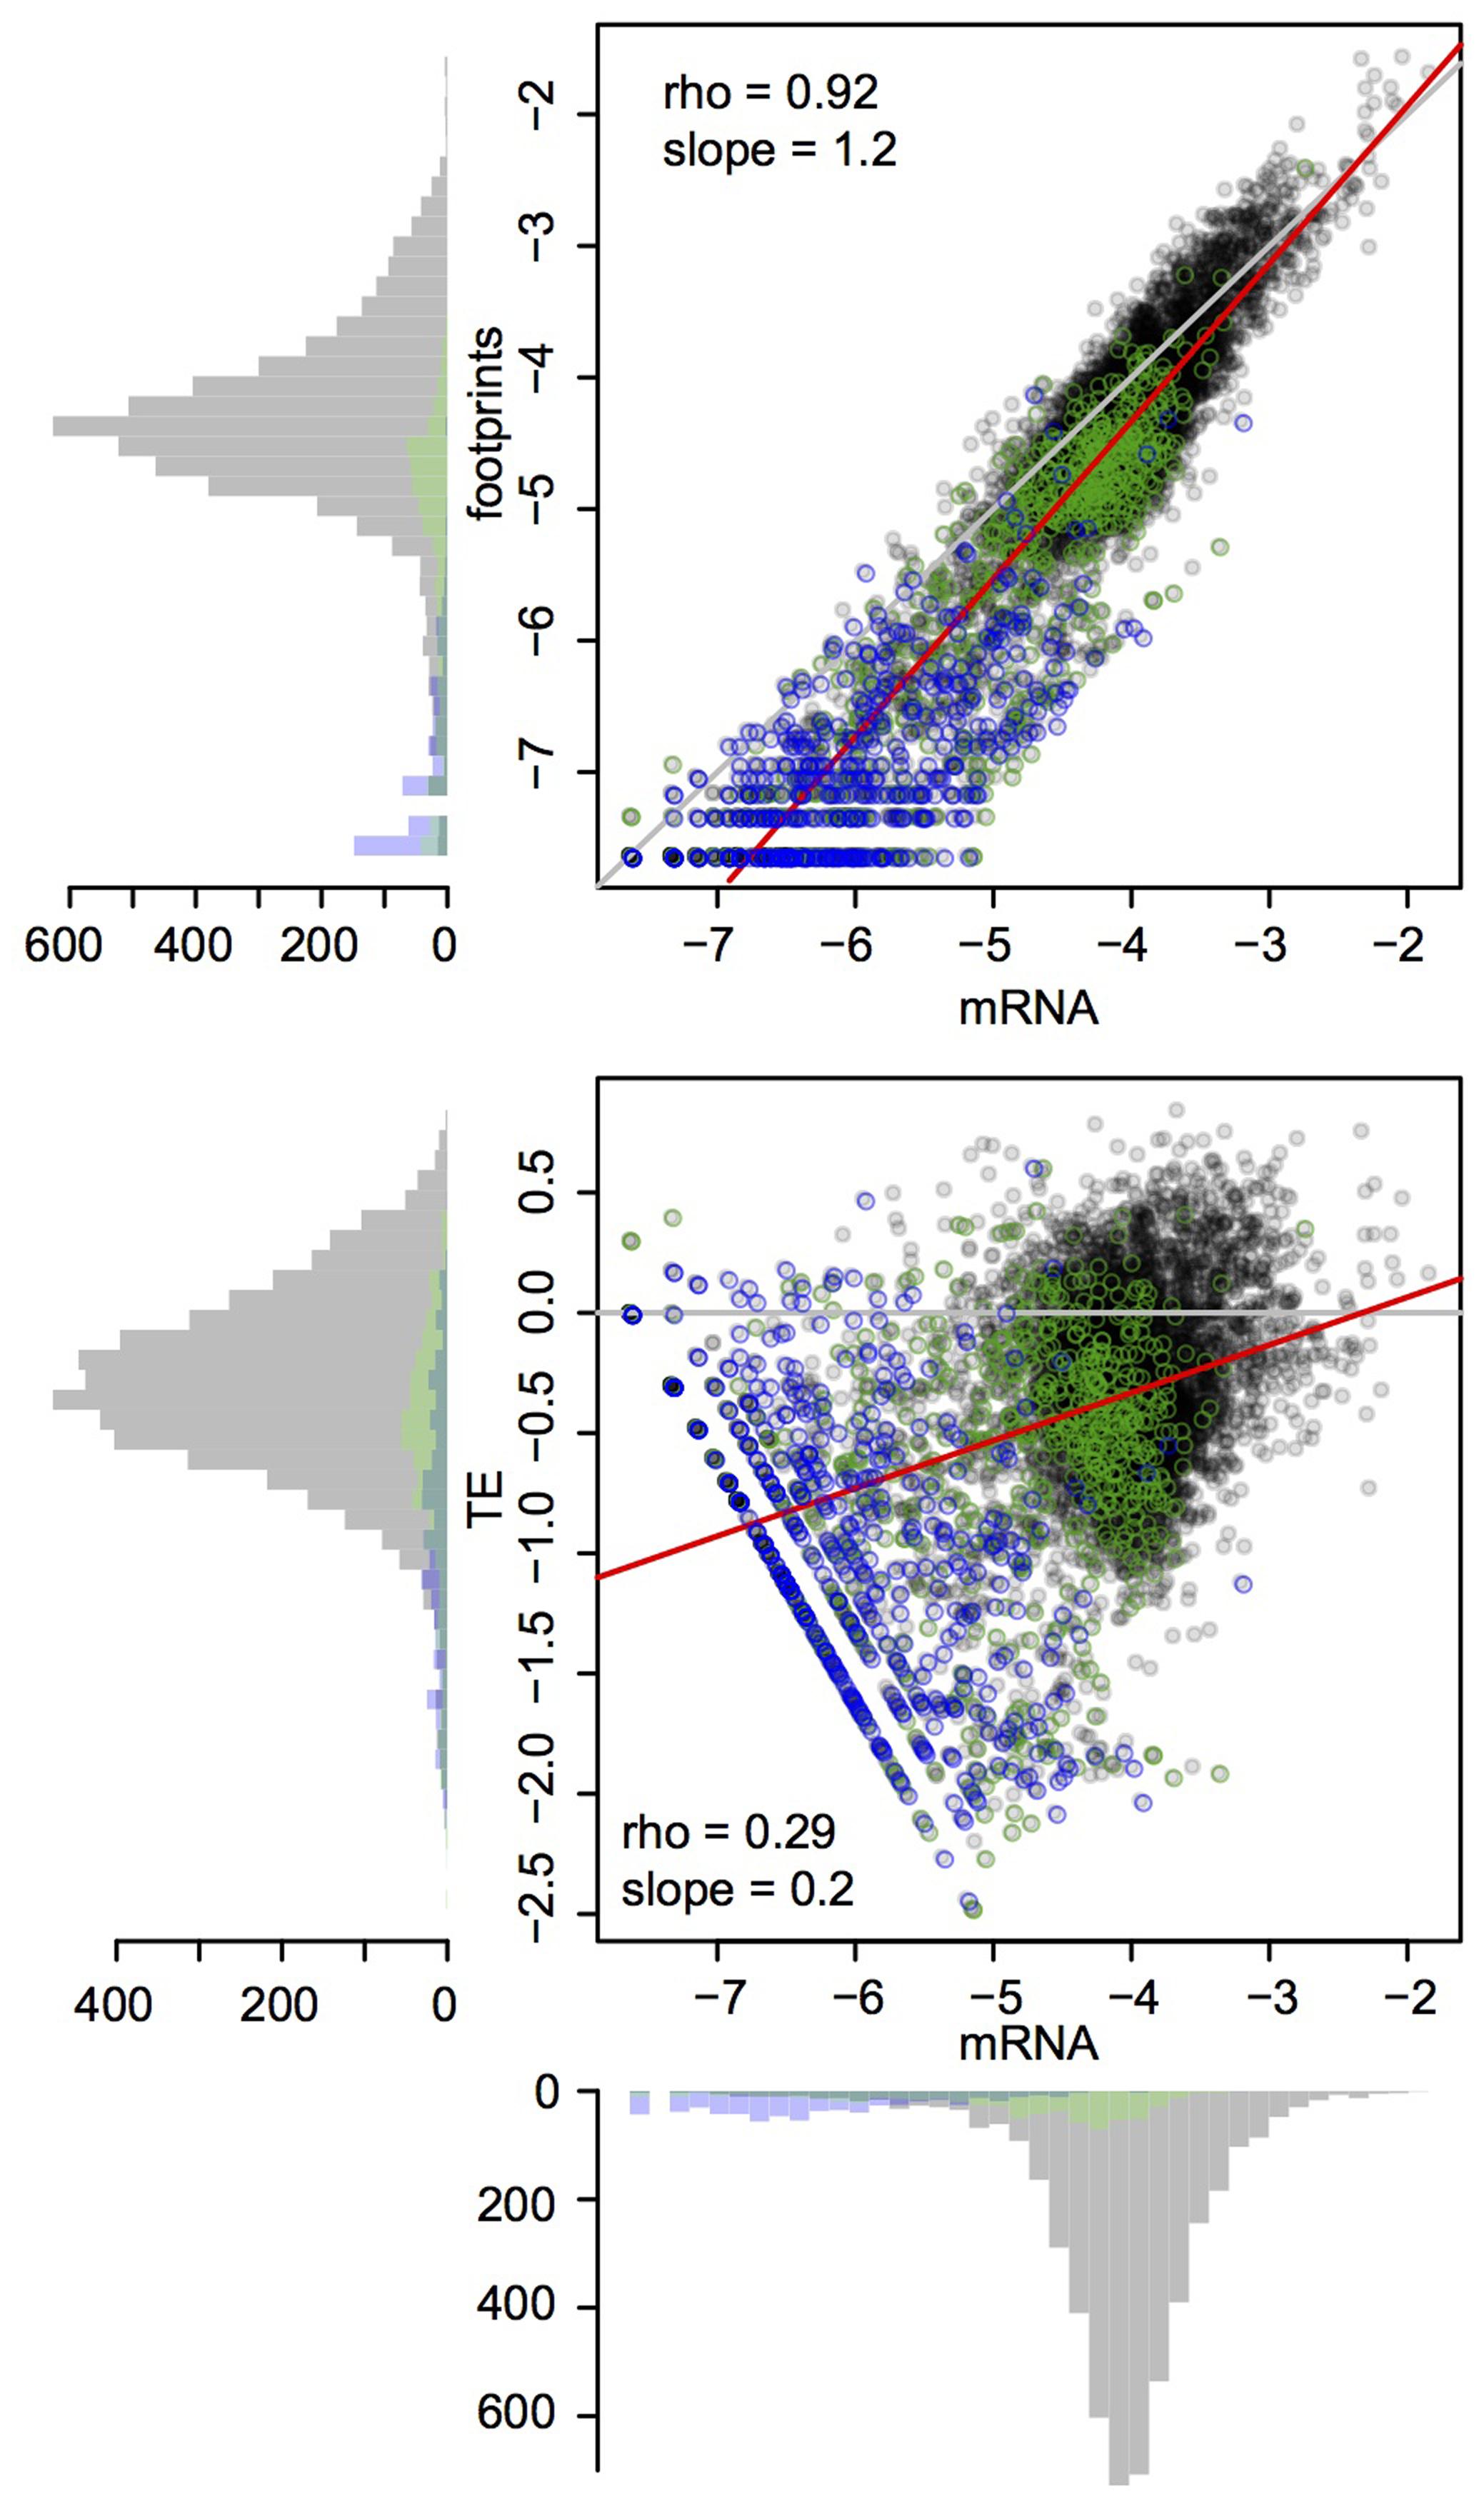 Global mRNA and footprint abundance.